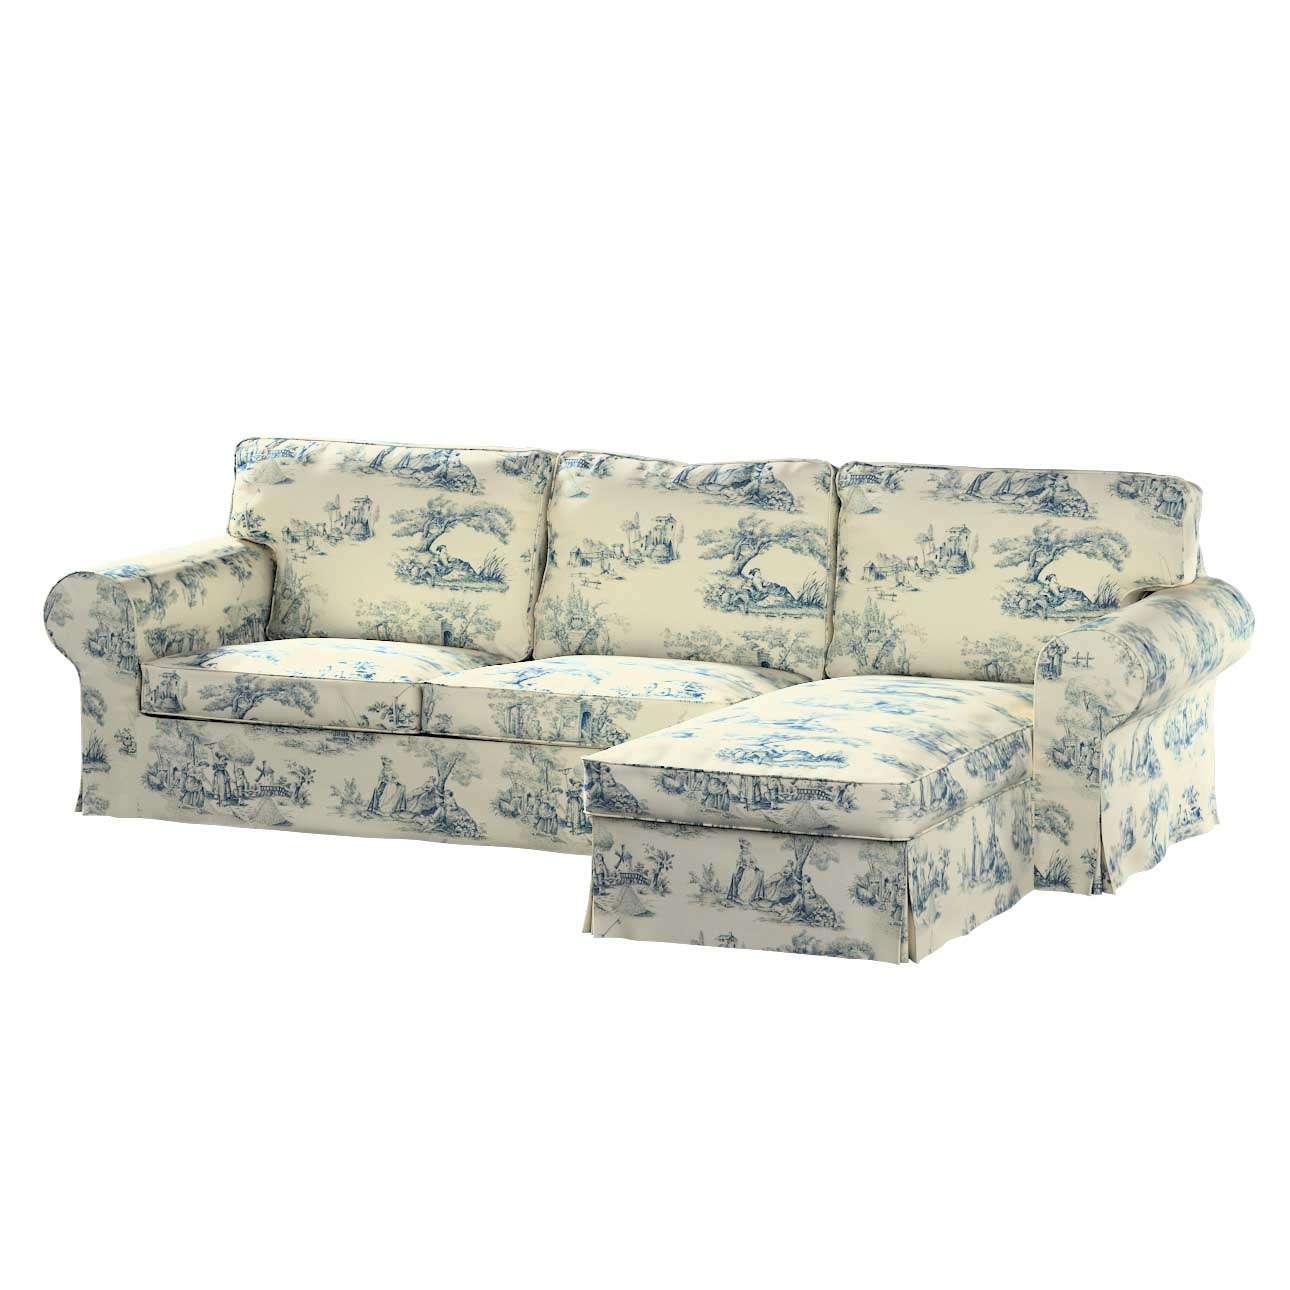 Potah na pohovku IKEA Ektorp 2-místná se šezlongem sofa ektorp 2-0s. i leżanka v kolekci Avignon, látka: 132-66